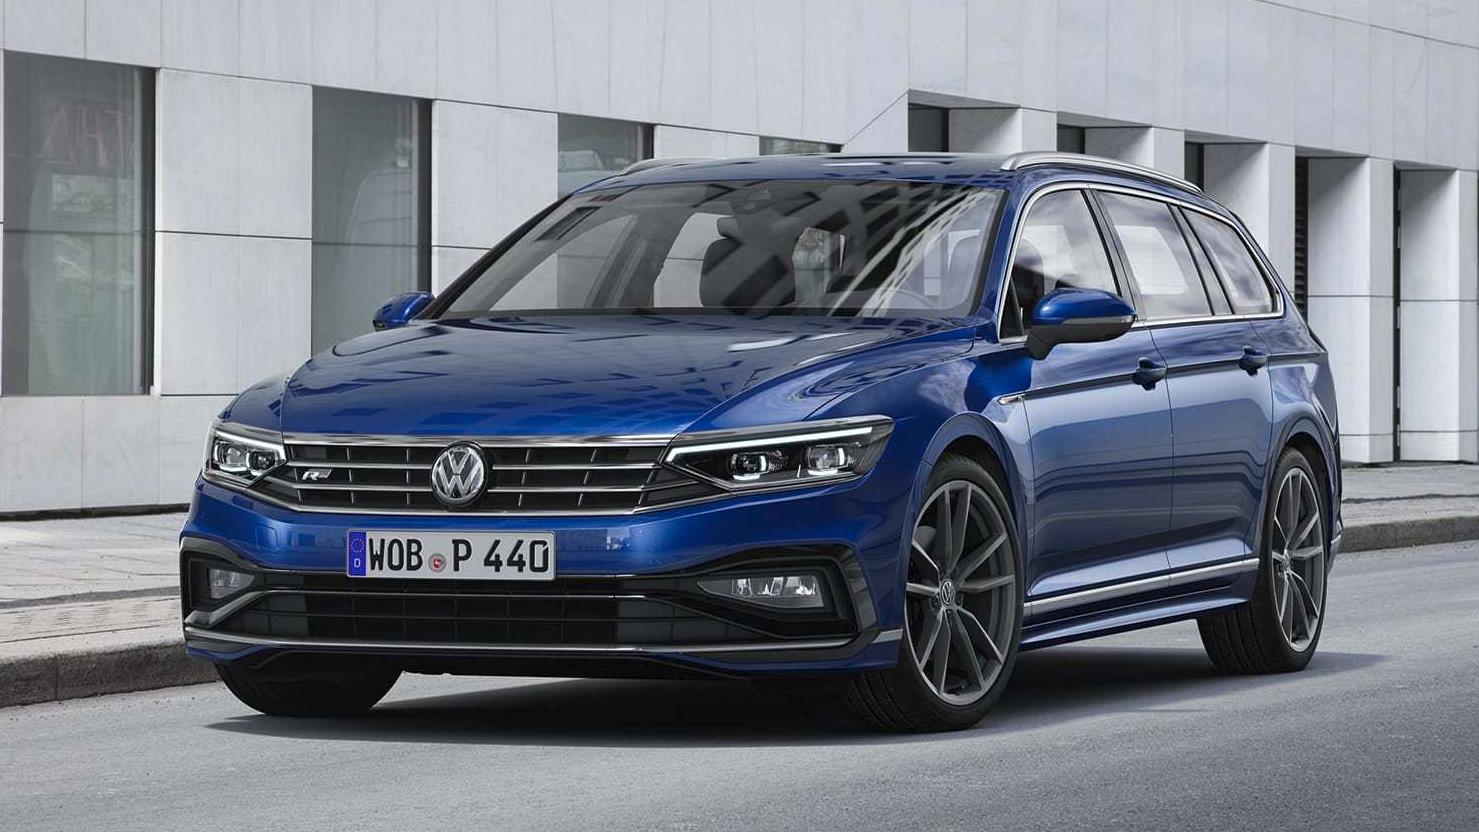 2020 volkswagen passat facelift officially unveiled  u2013 redline